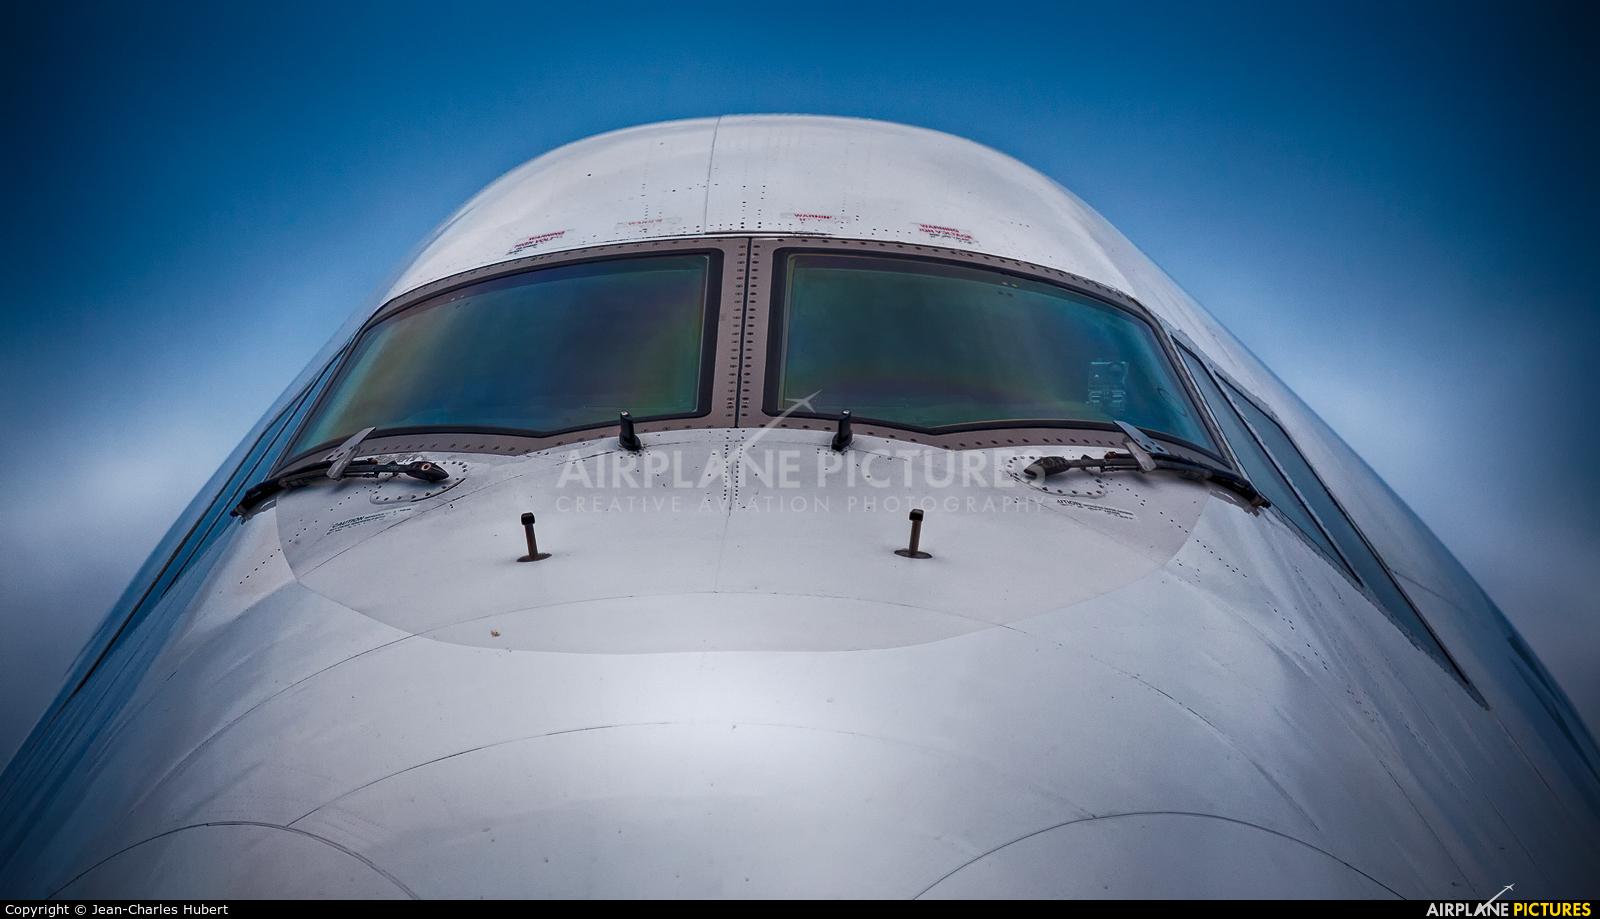 Lufthansa D-ABVP aircraft at Montreal - Pierre Elliott Trudeau Intl, QC